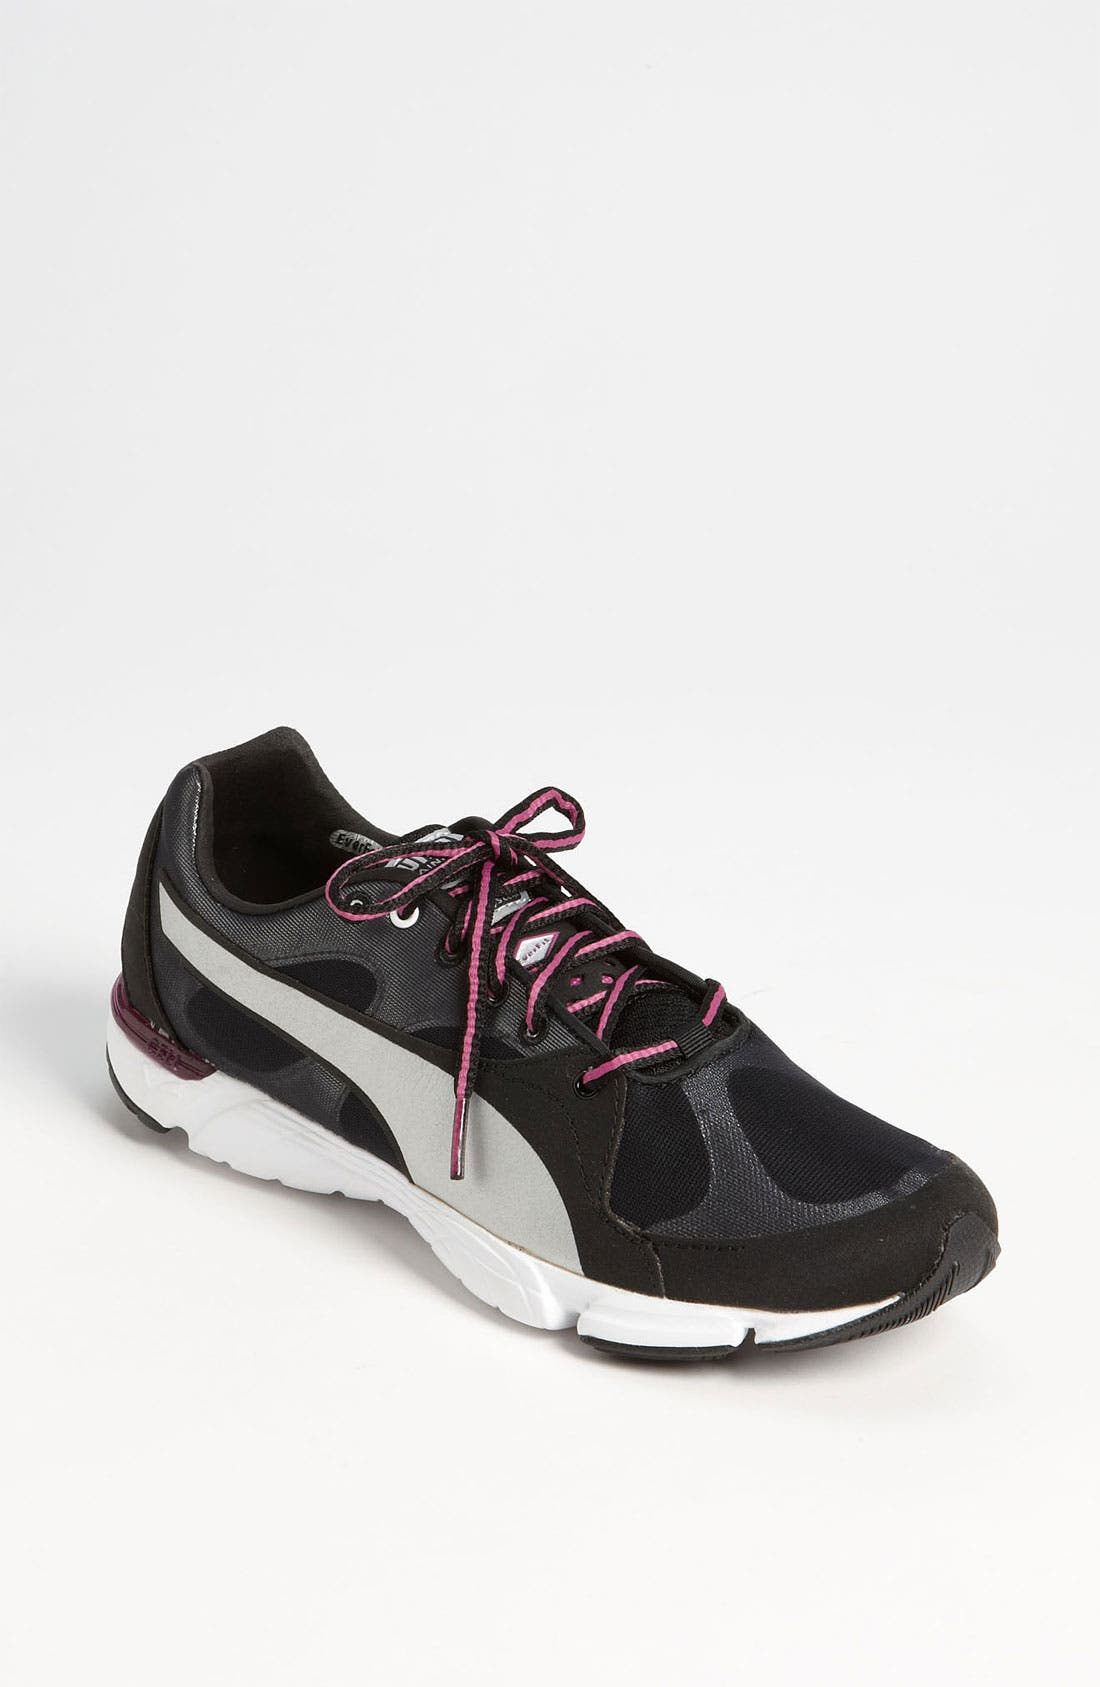 Main Image - PUMA 'Formlite XT' Sneaker (Women)